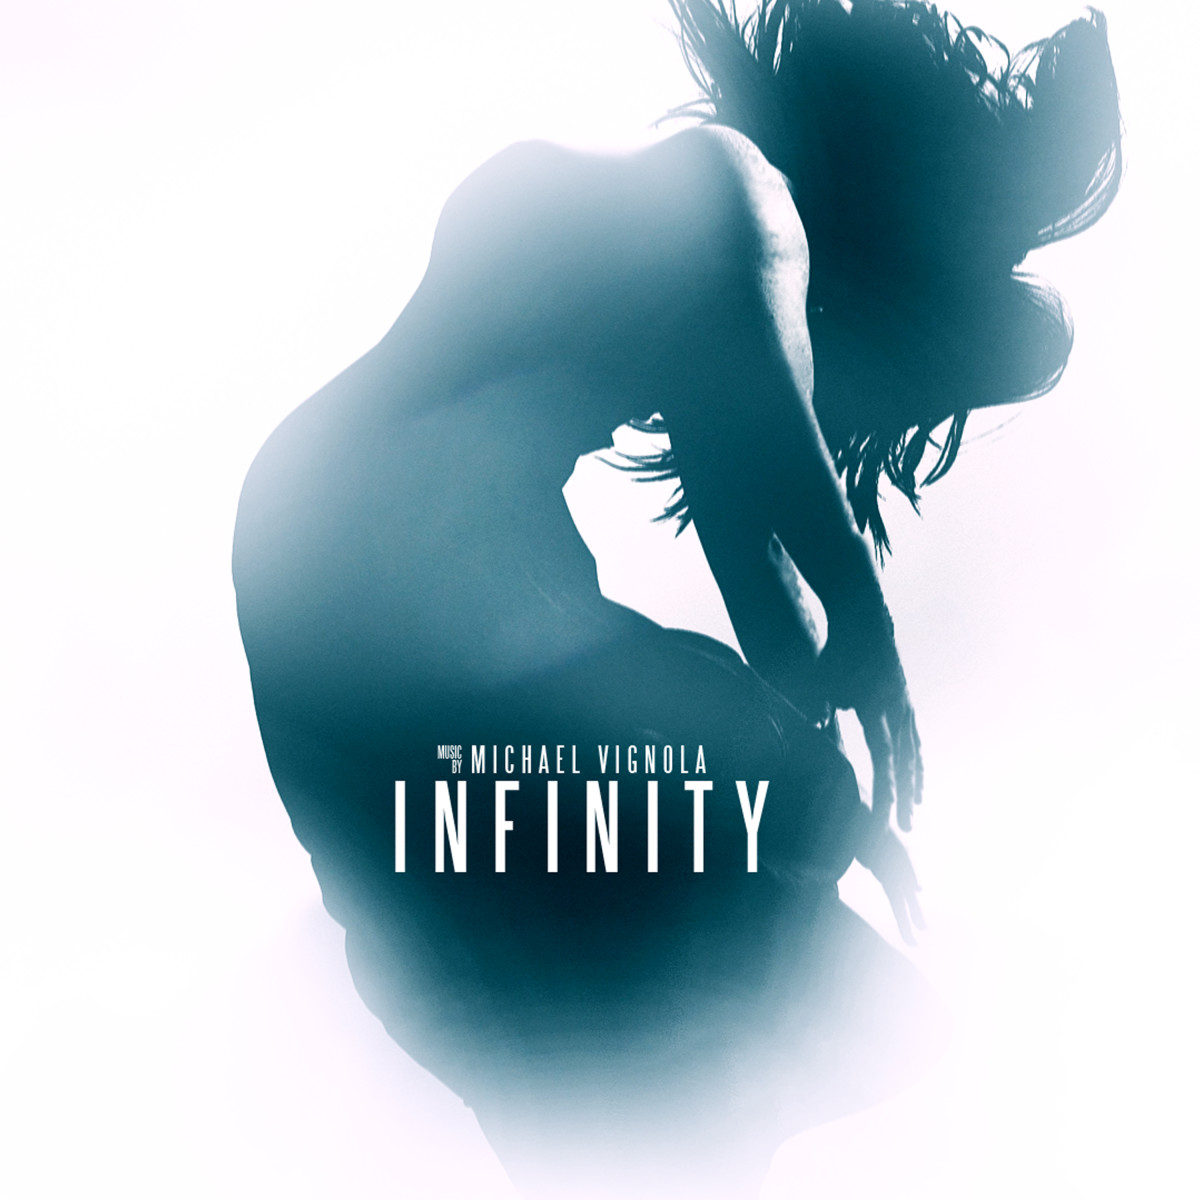 album-review-michael-vignola-infinity